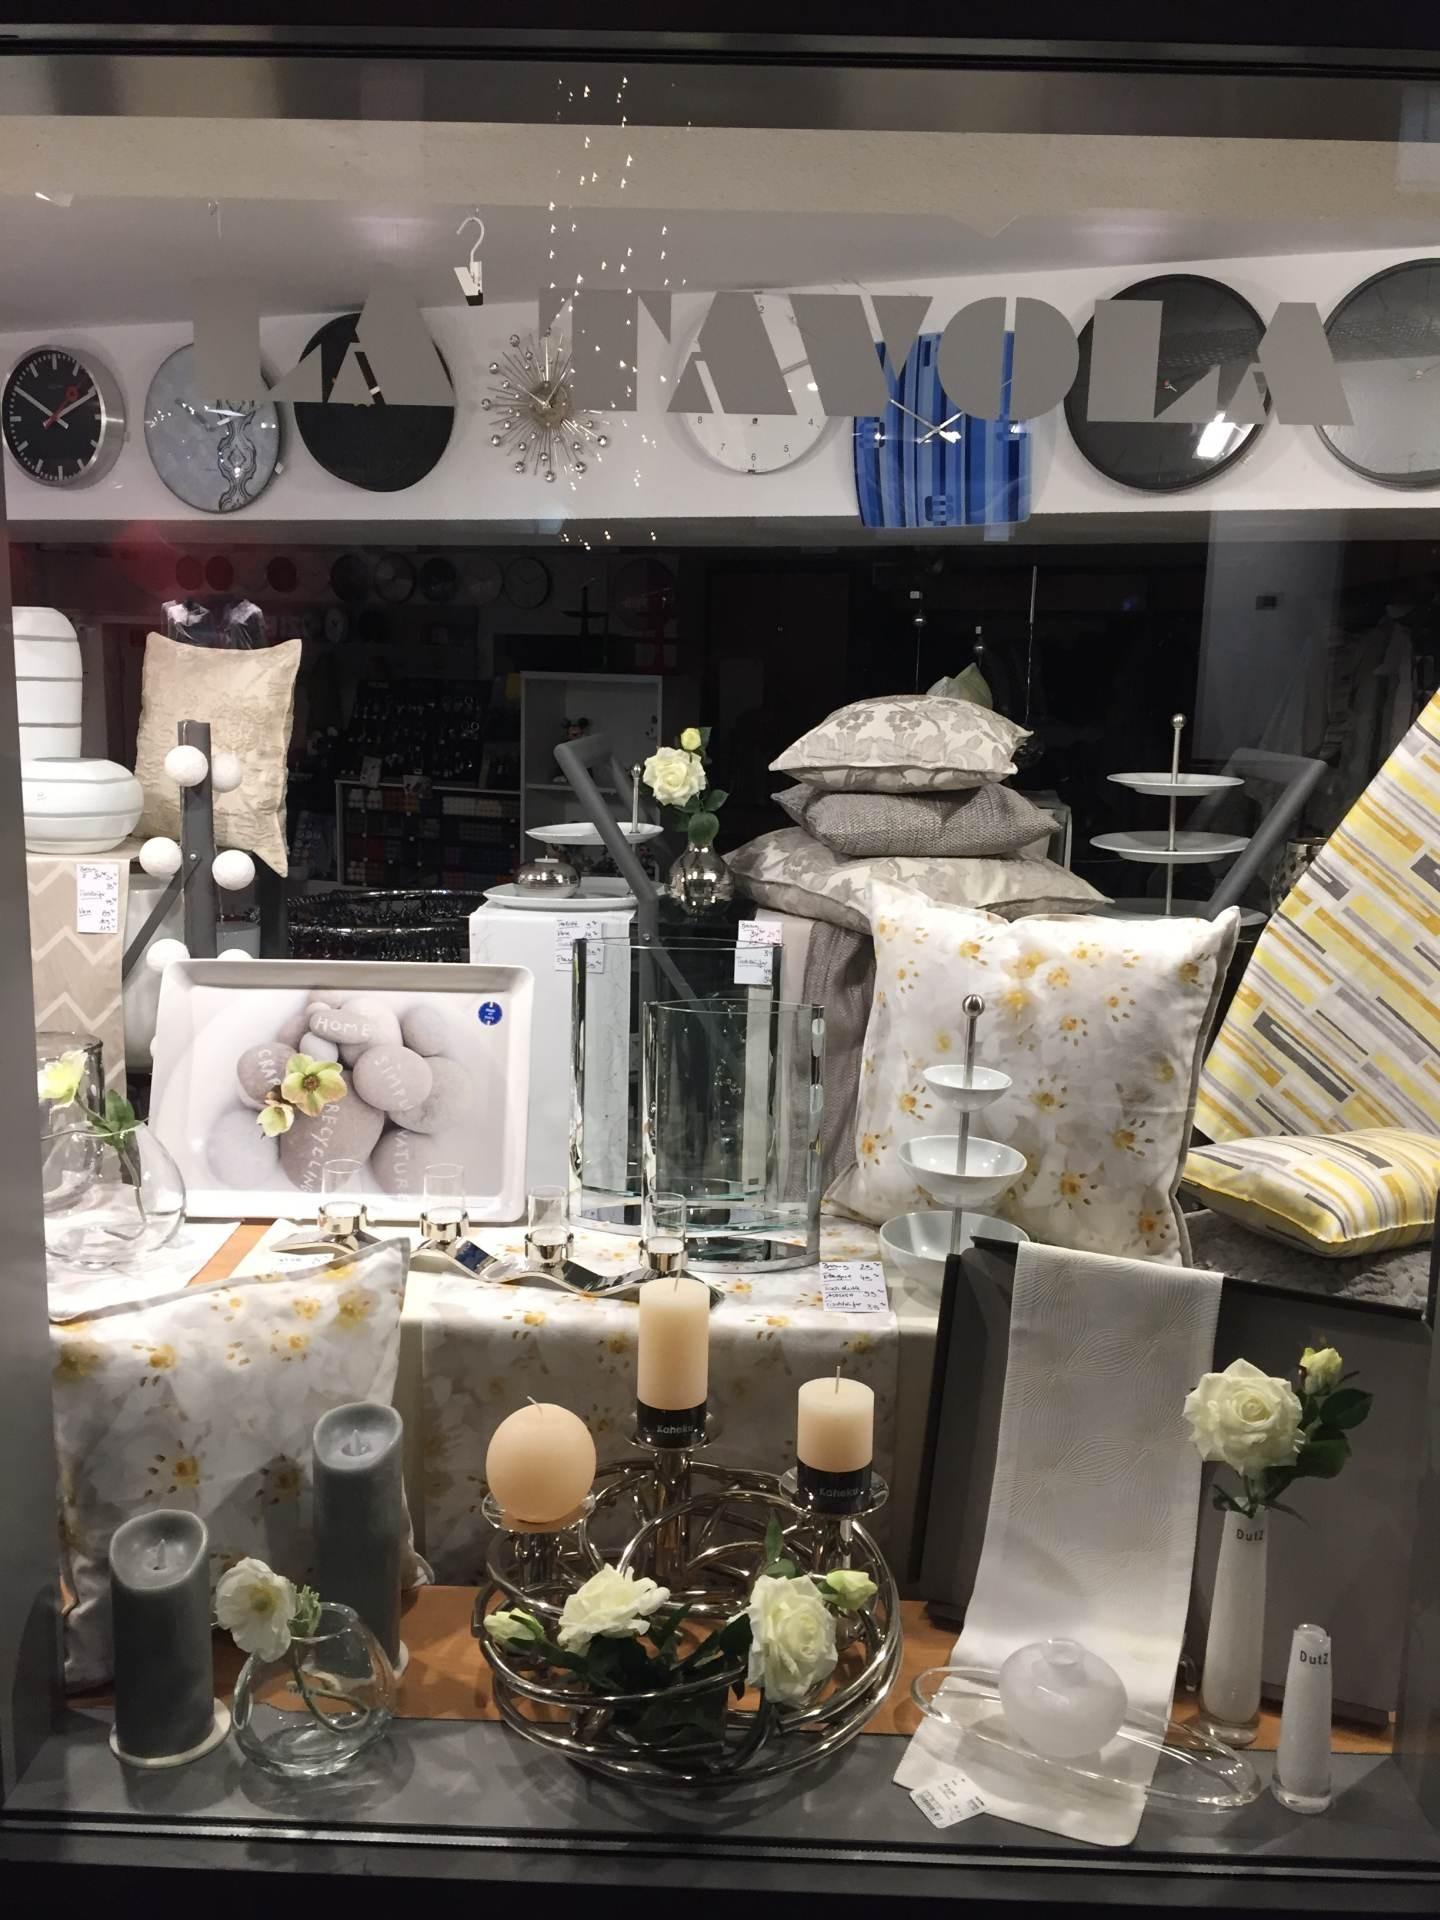 la-tavola-schaufenster-2017-01-12-m-min